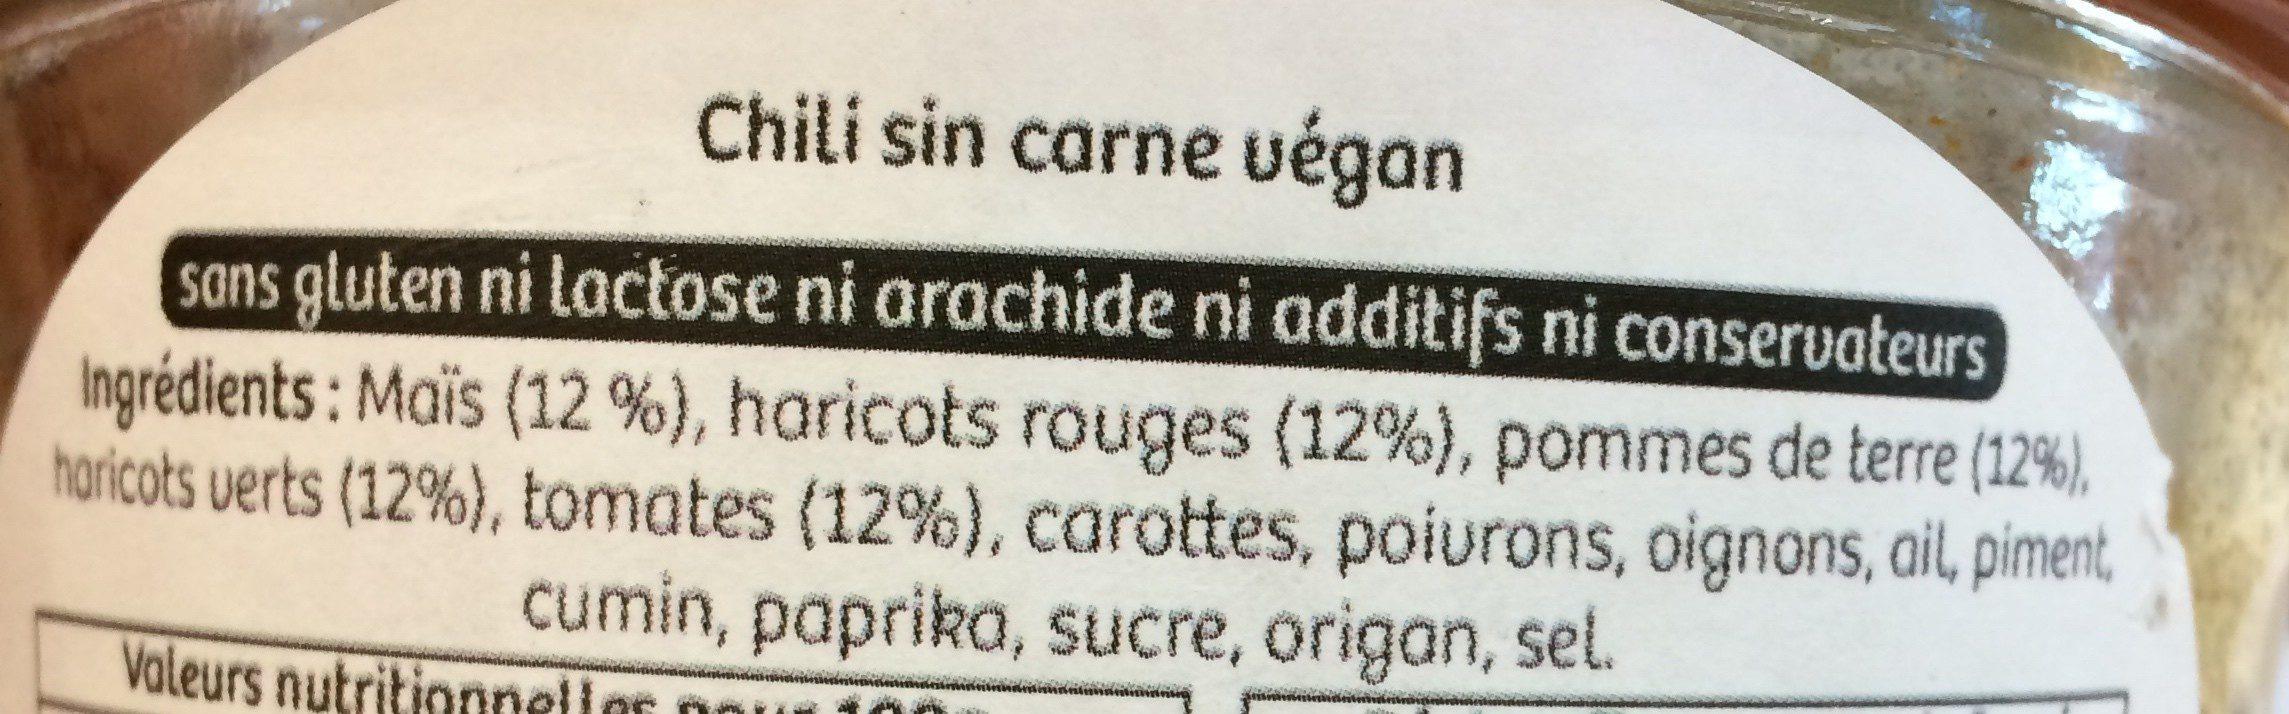 Chili sin carne vegan - Ingrédients